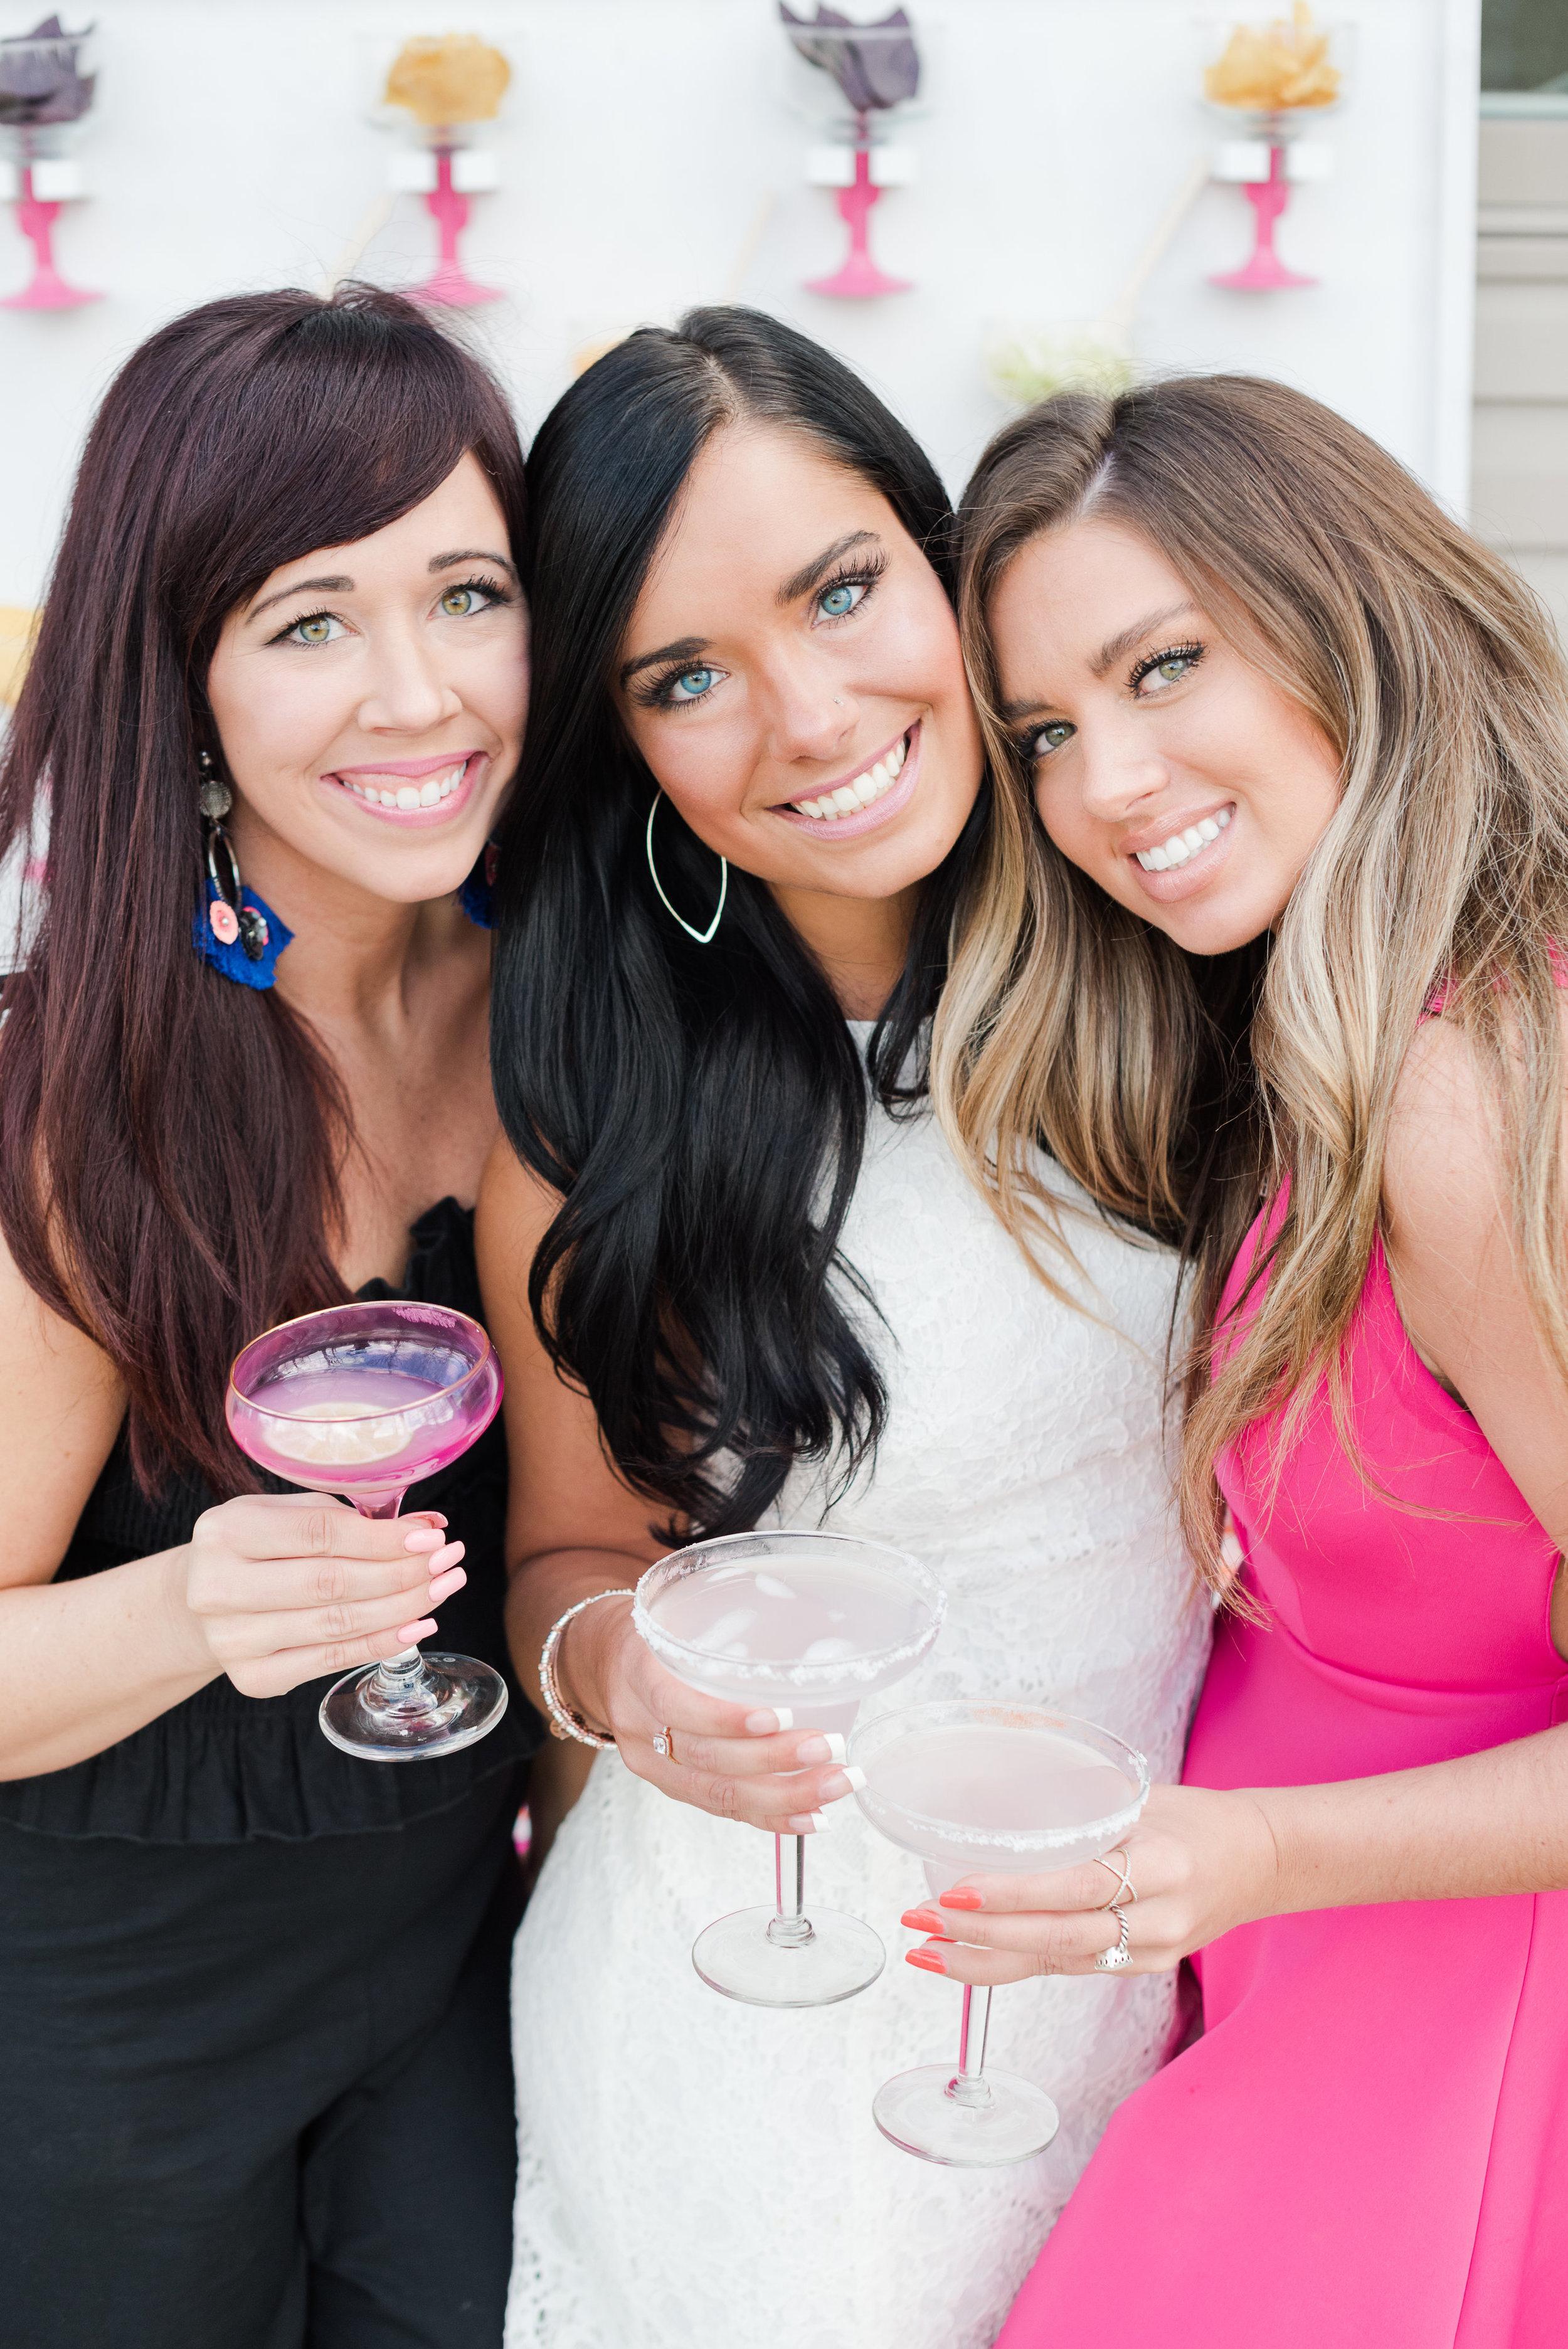 Fiesta-Party-Inspiration-by-Event-Prep-Cassandra-Clair-Photograpy-Amanda-Collins-53.jpg